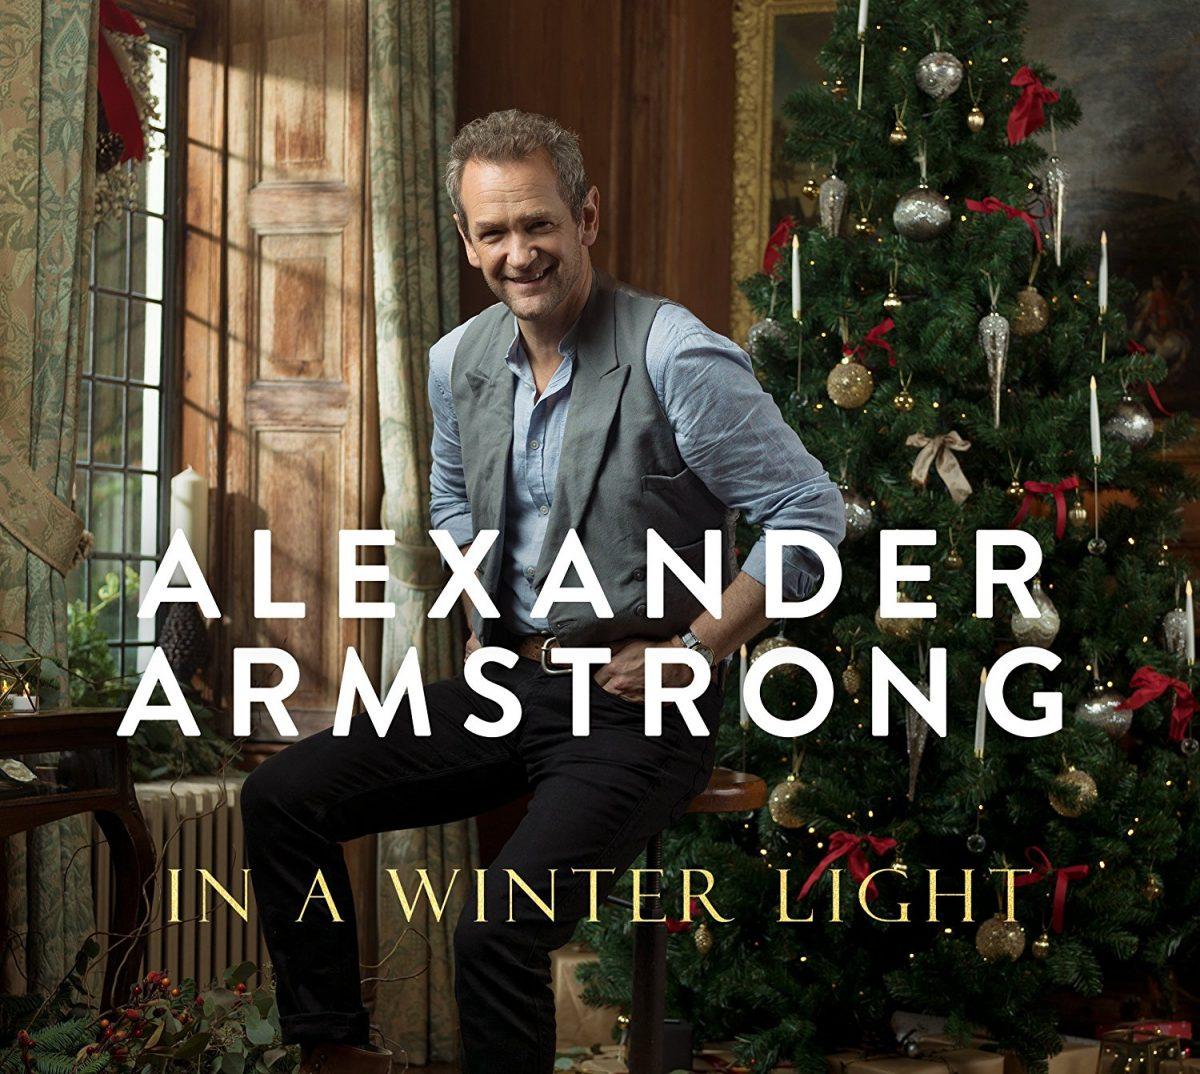 Alexander Armstrong – In a Winter Light